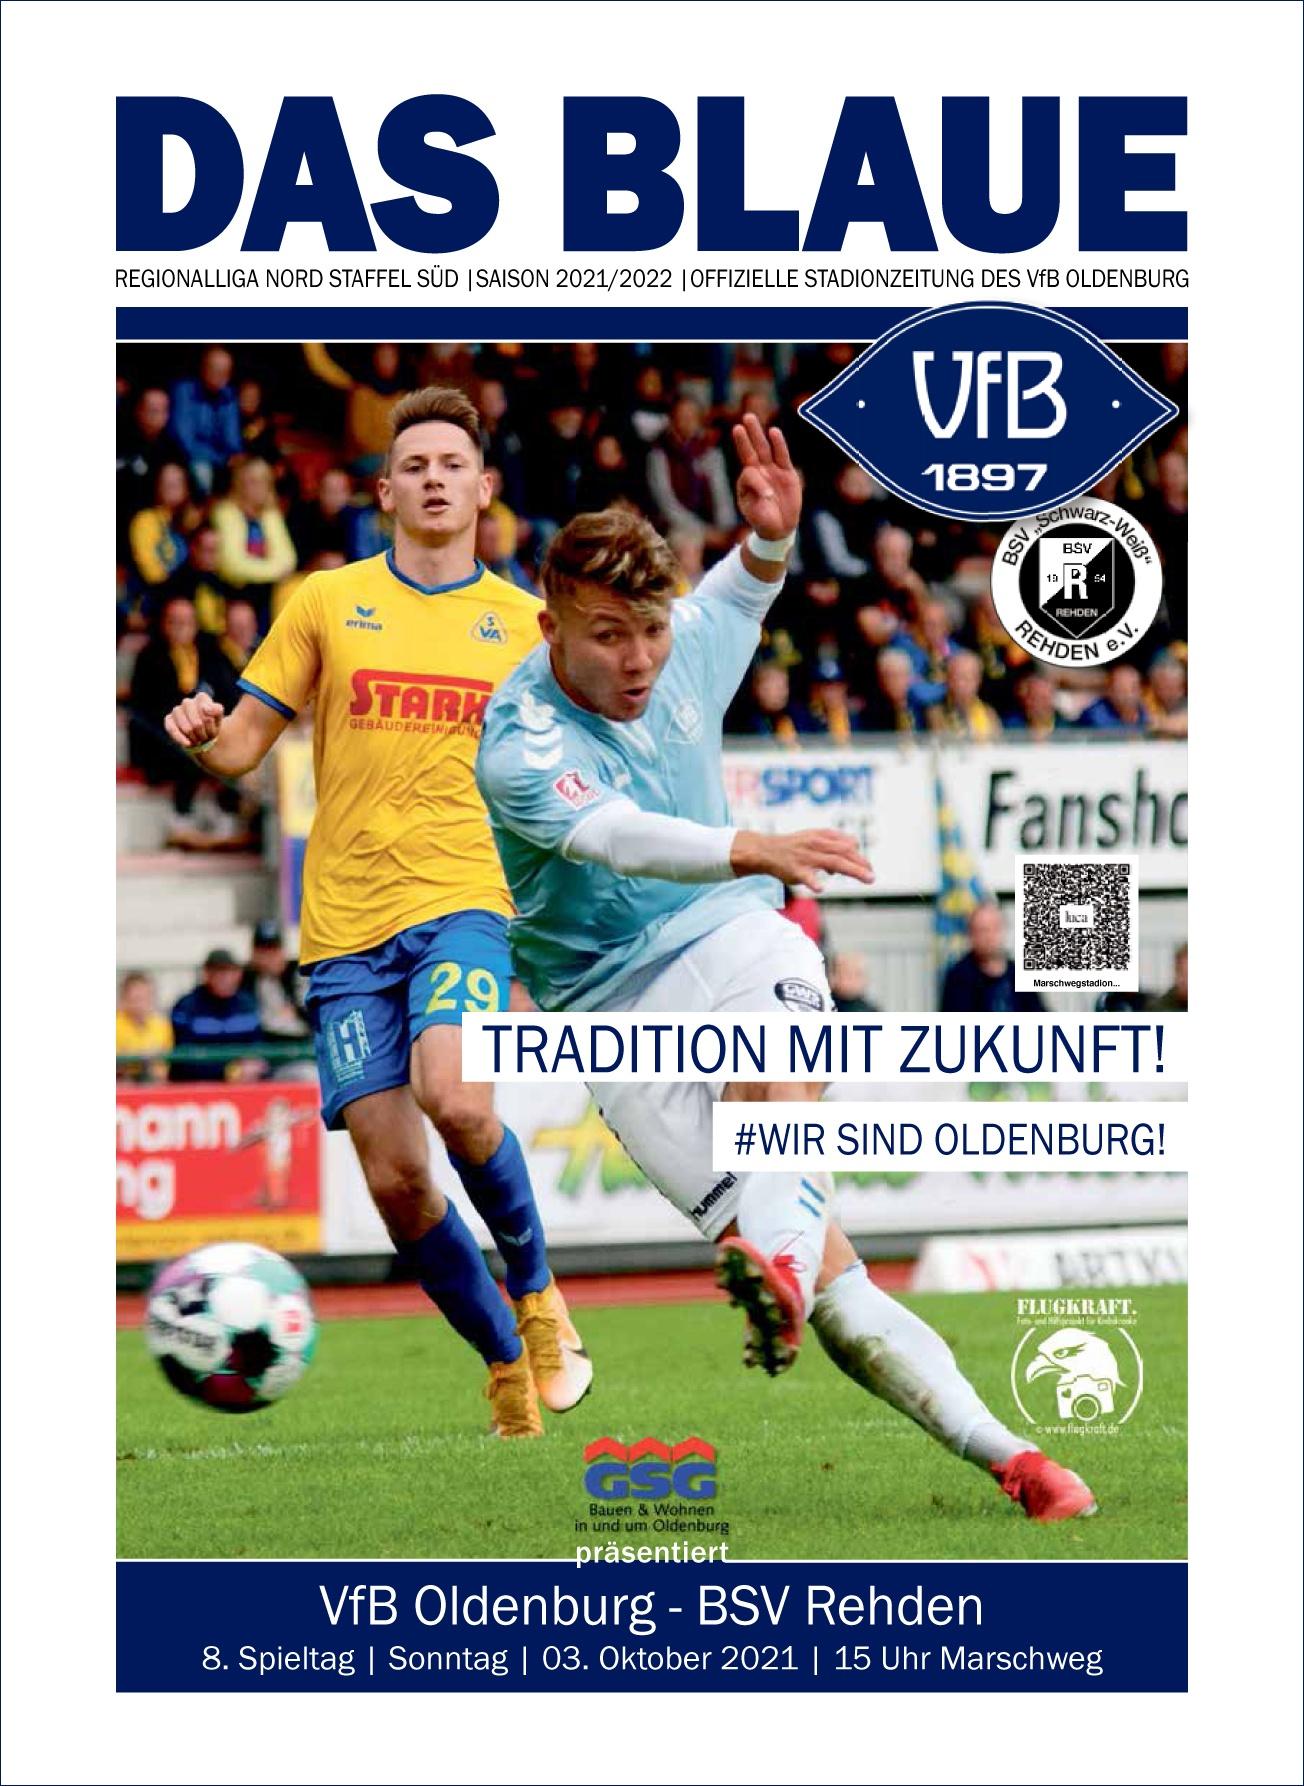 https://vfb-oldenburg.de/wp-content/uploads/2021/10/VFB_Oldenburg_8_Spieltag_2021_2022-1.jpg